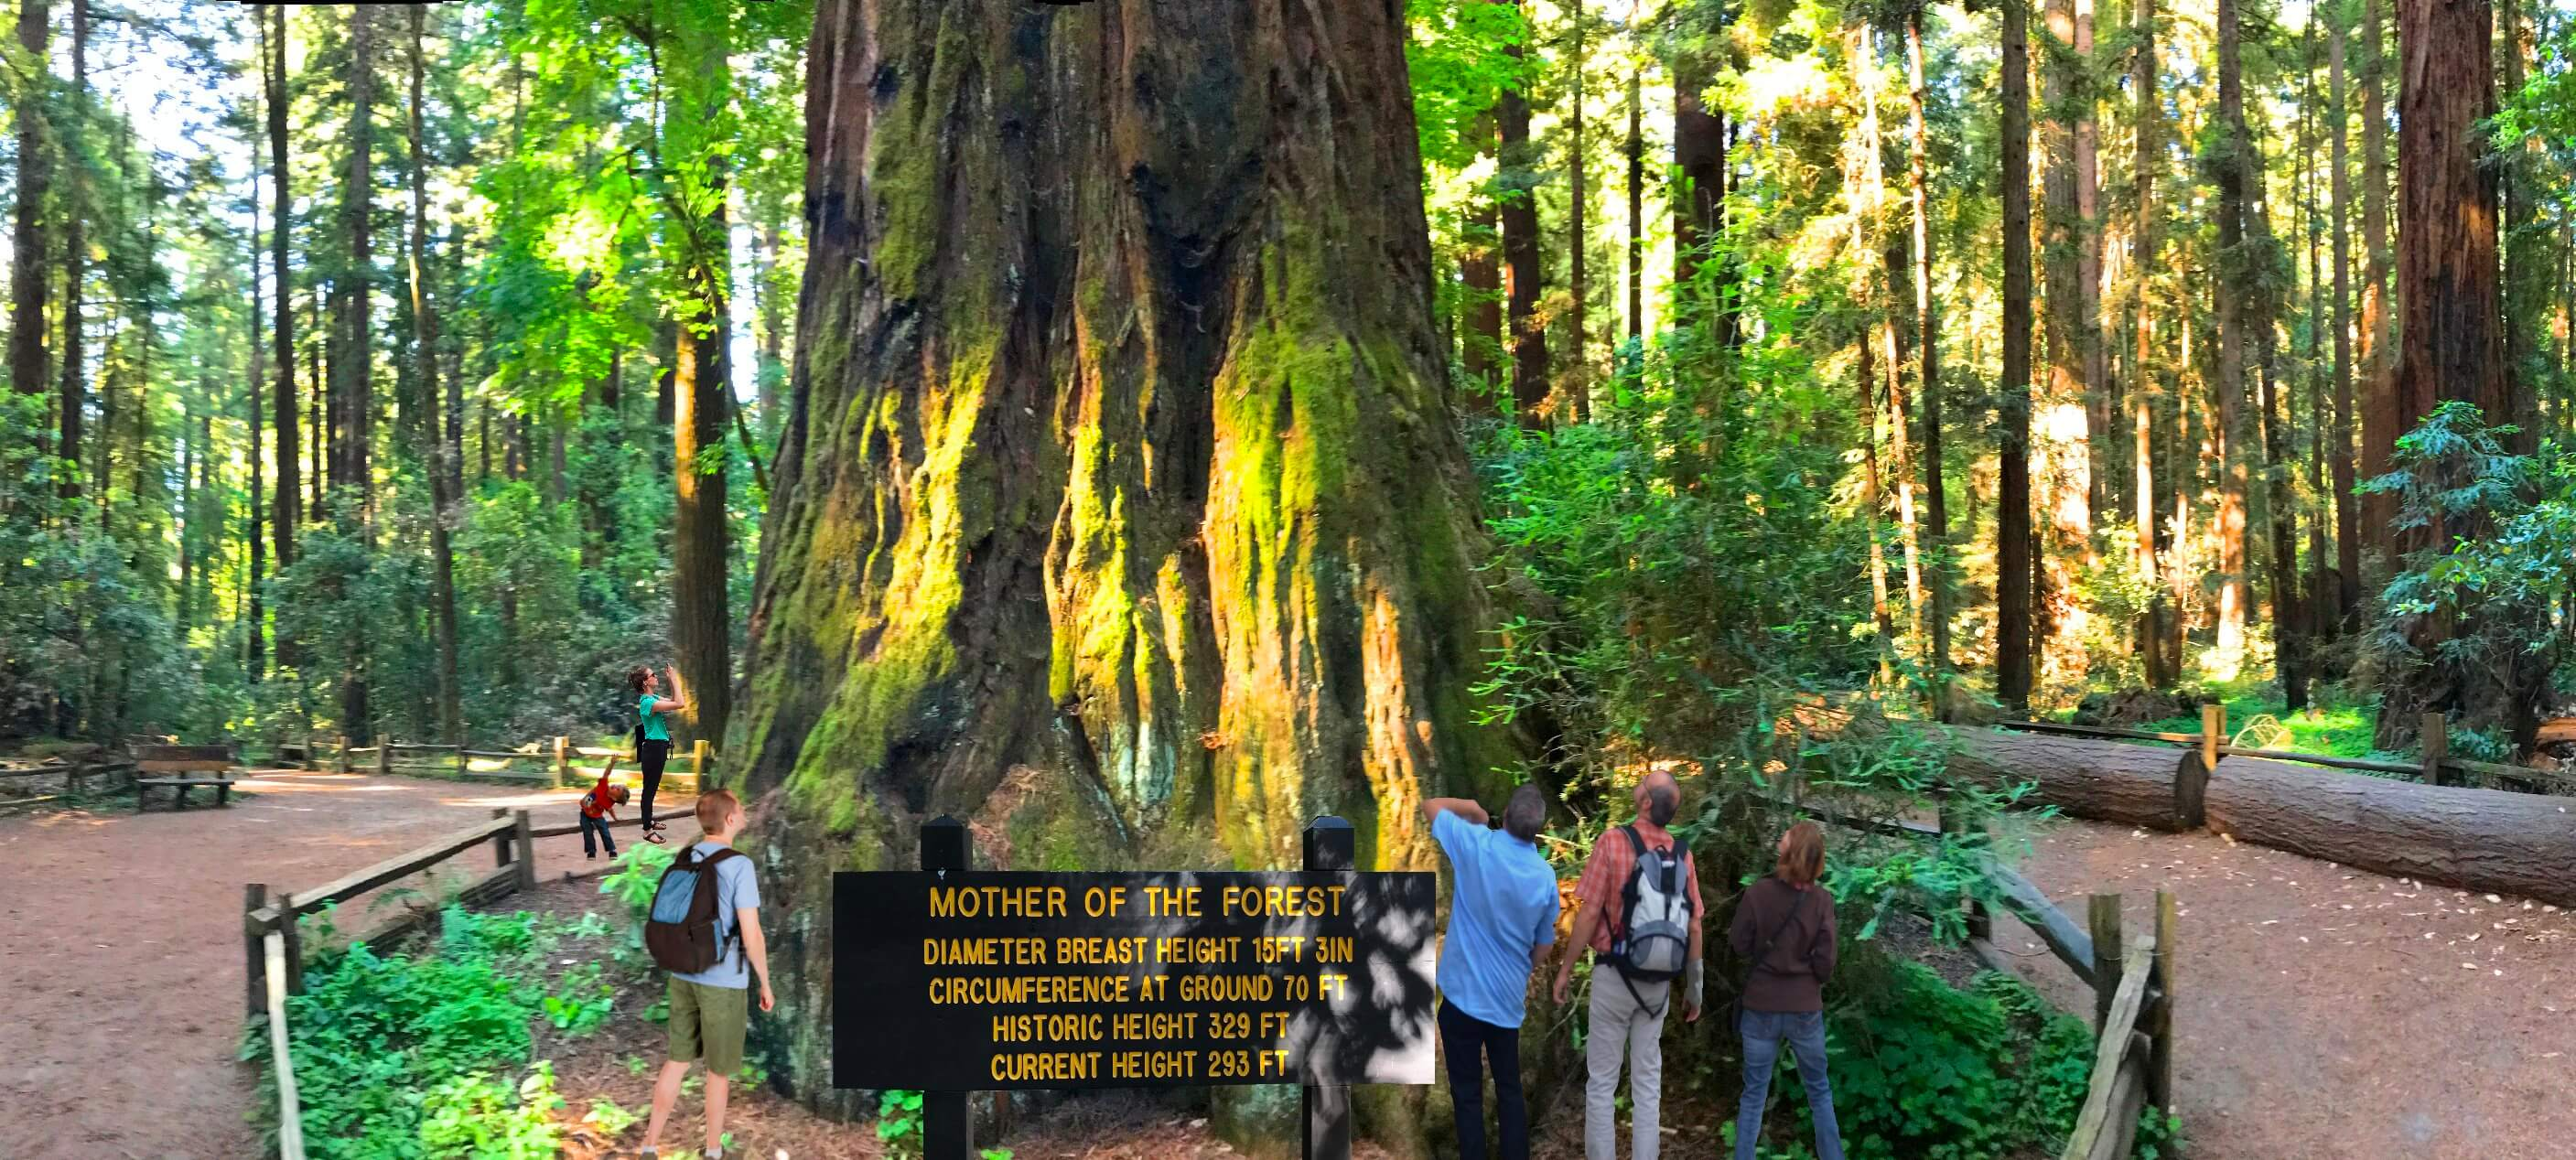 big_basin_giant_redwood_big_sequoias_trees_tour_from_san_francisco